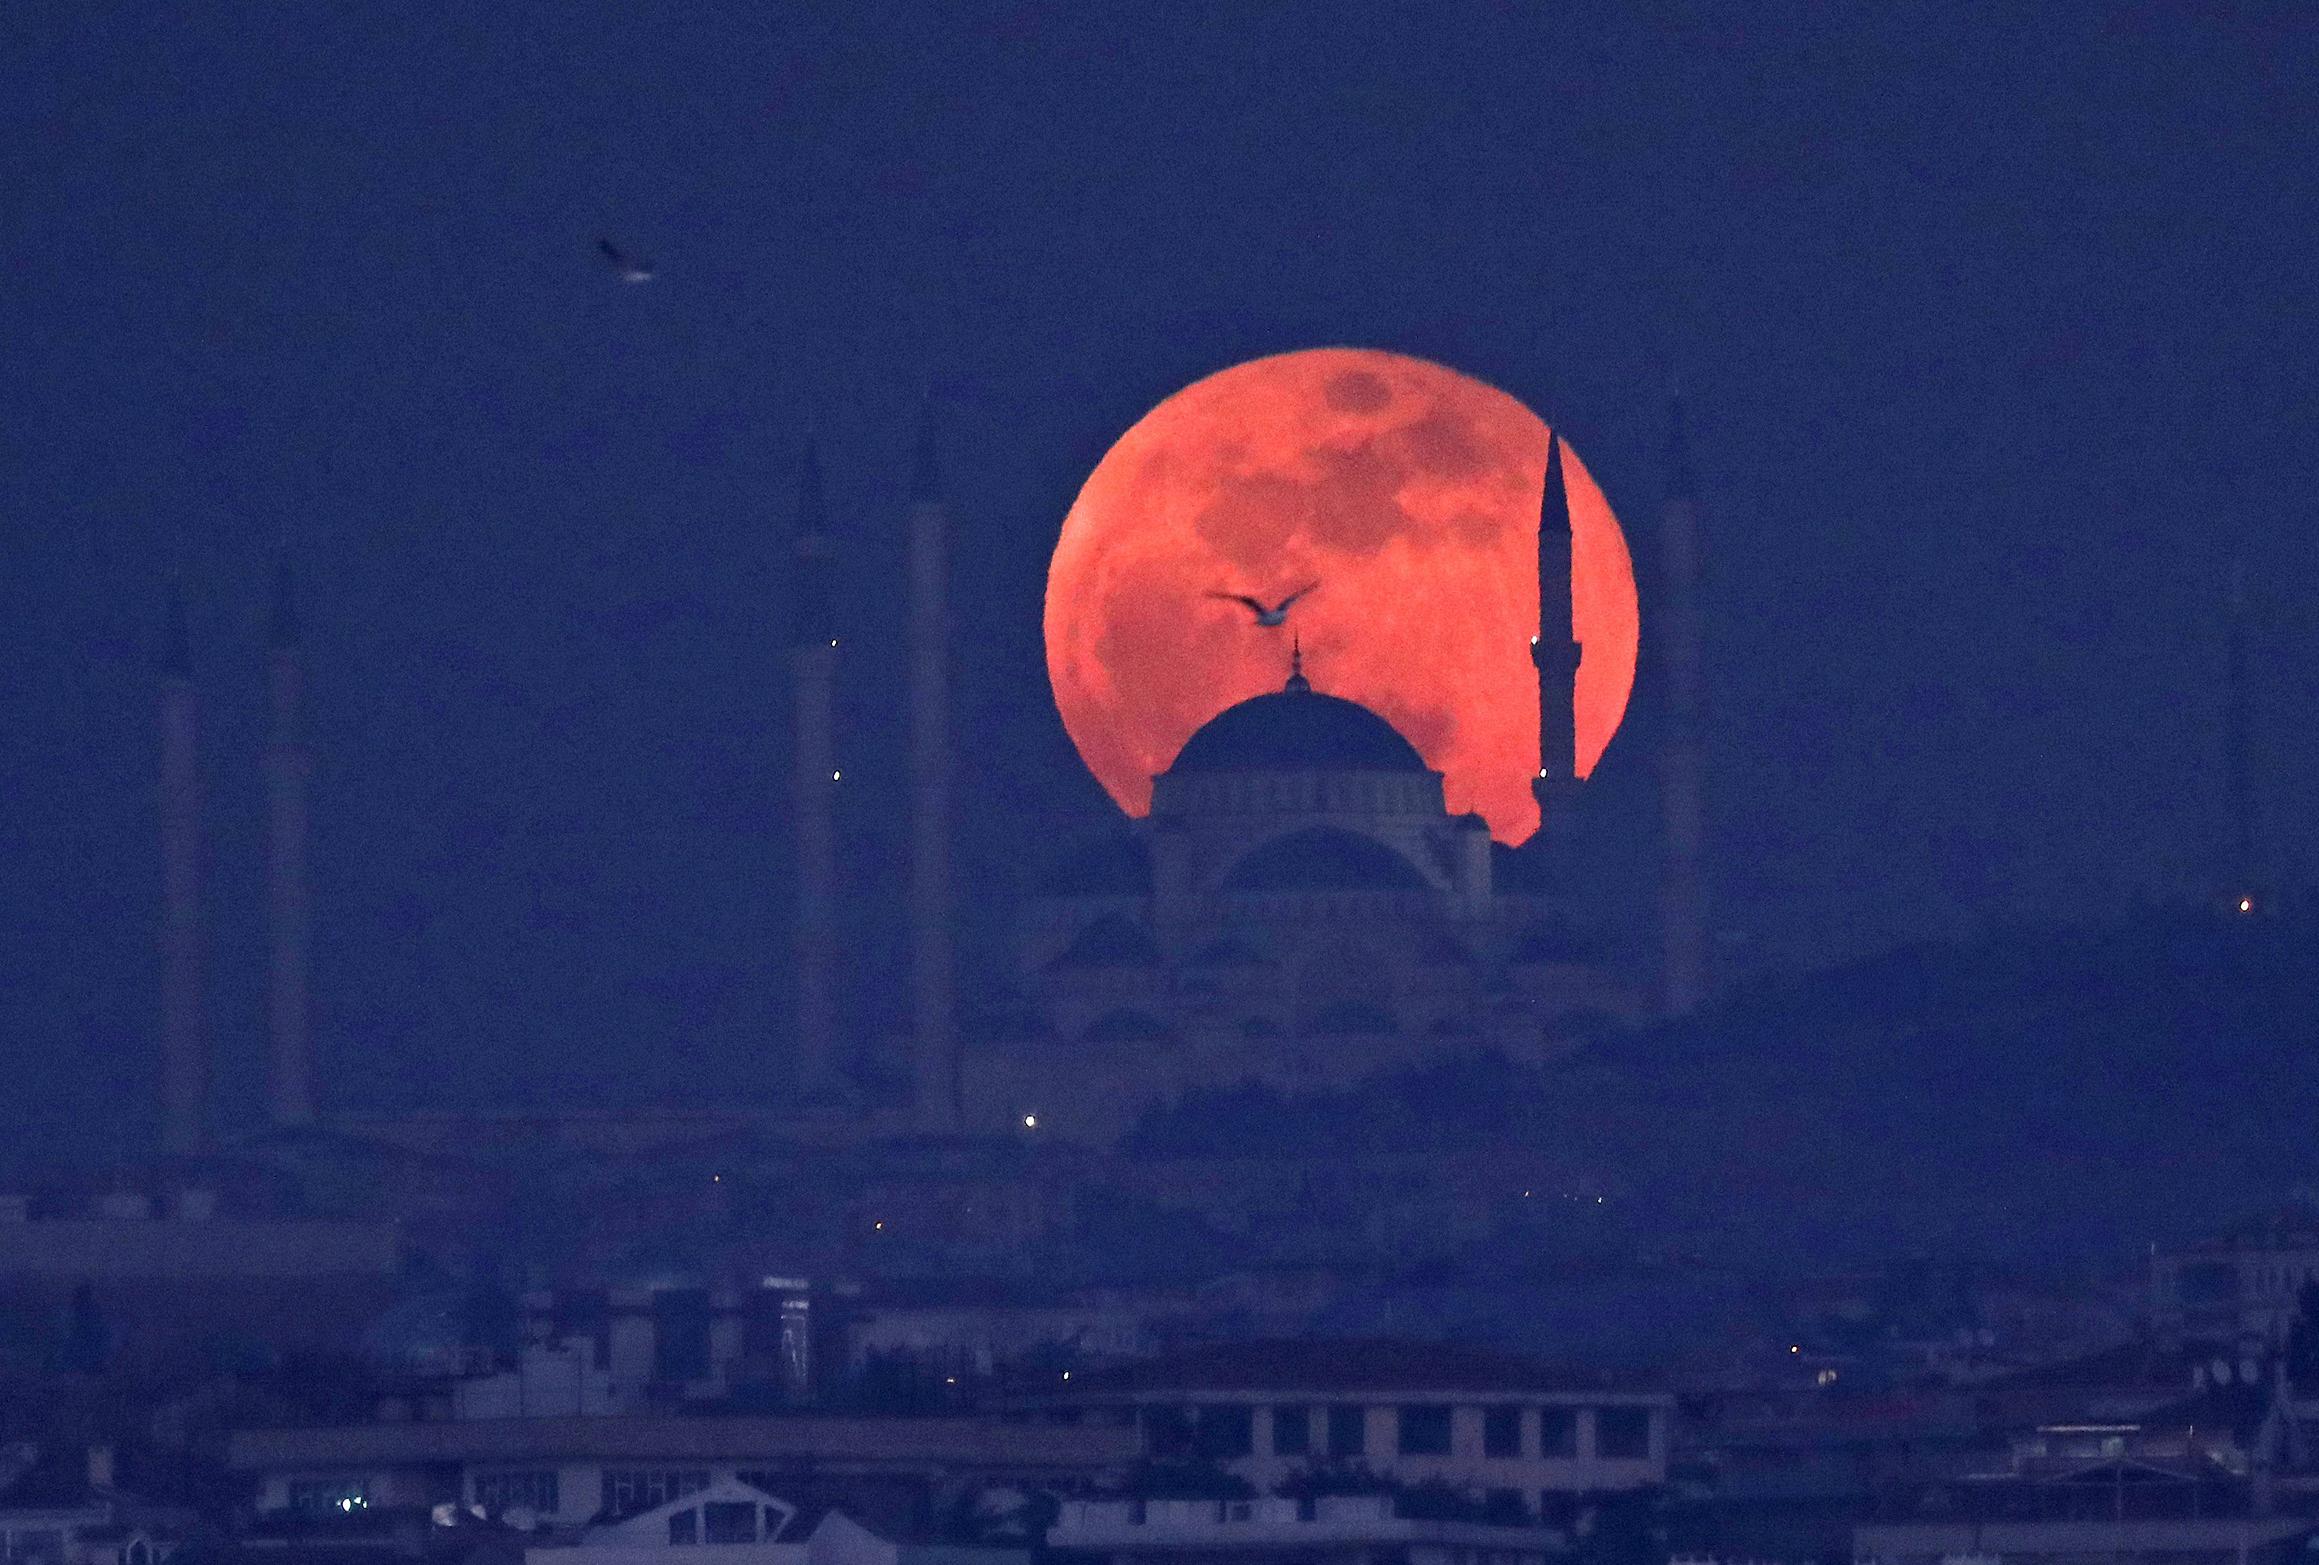 red moon 2019 energy - photo #49